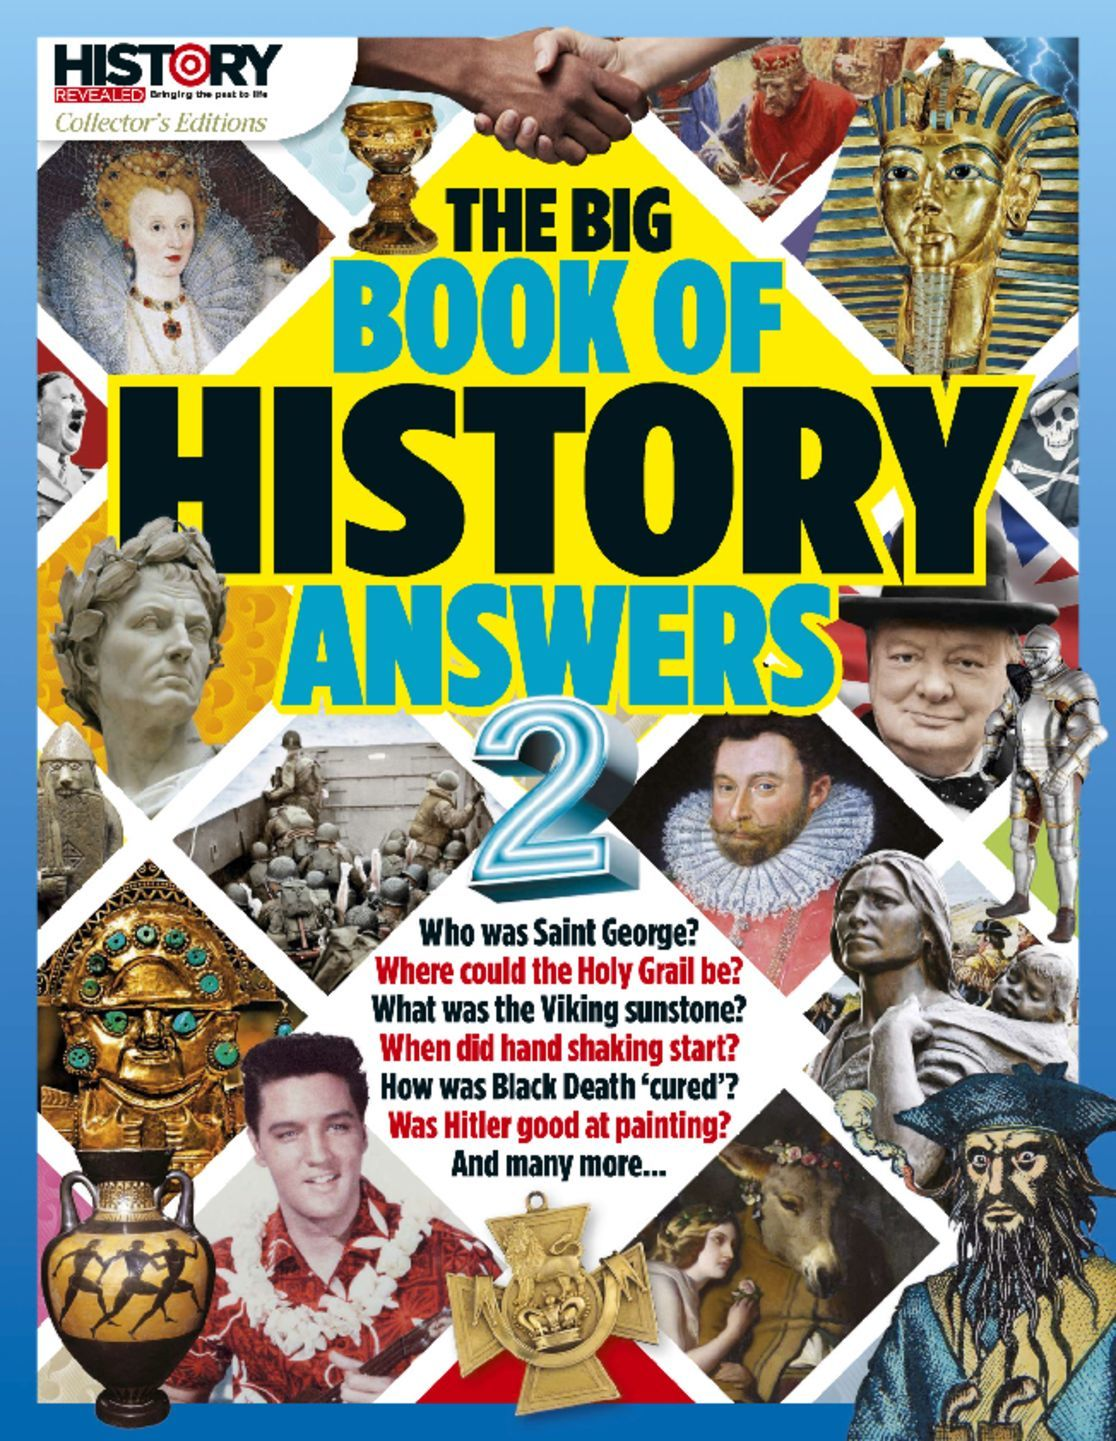 Focus Big Book of Answers 2 Digital